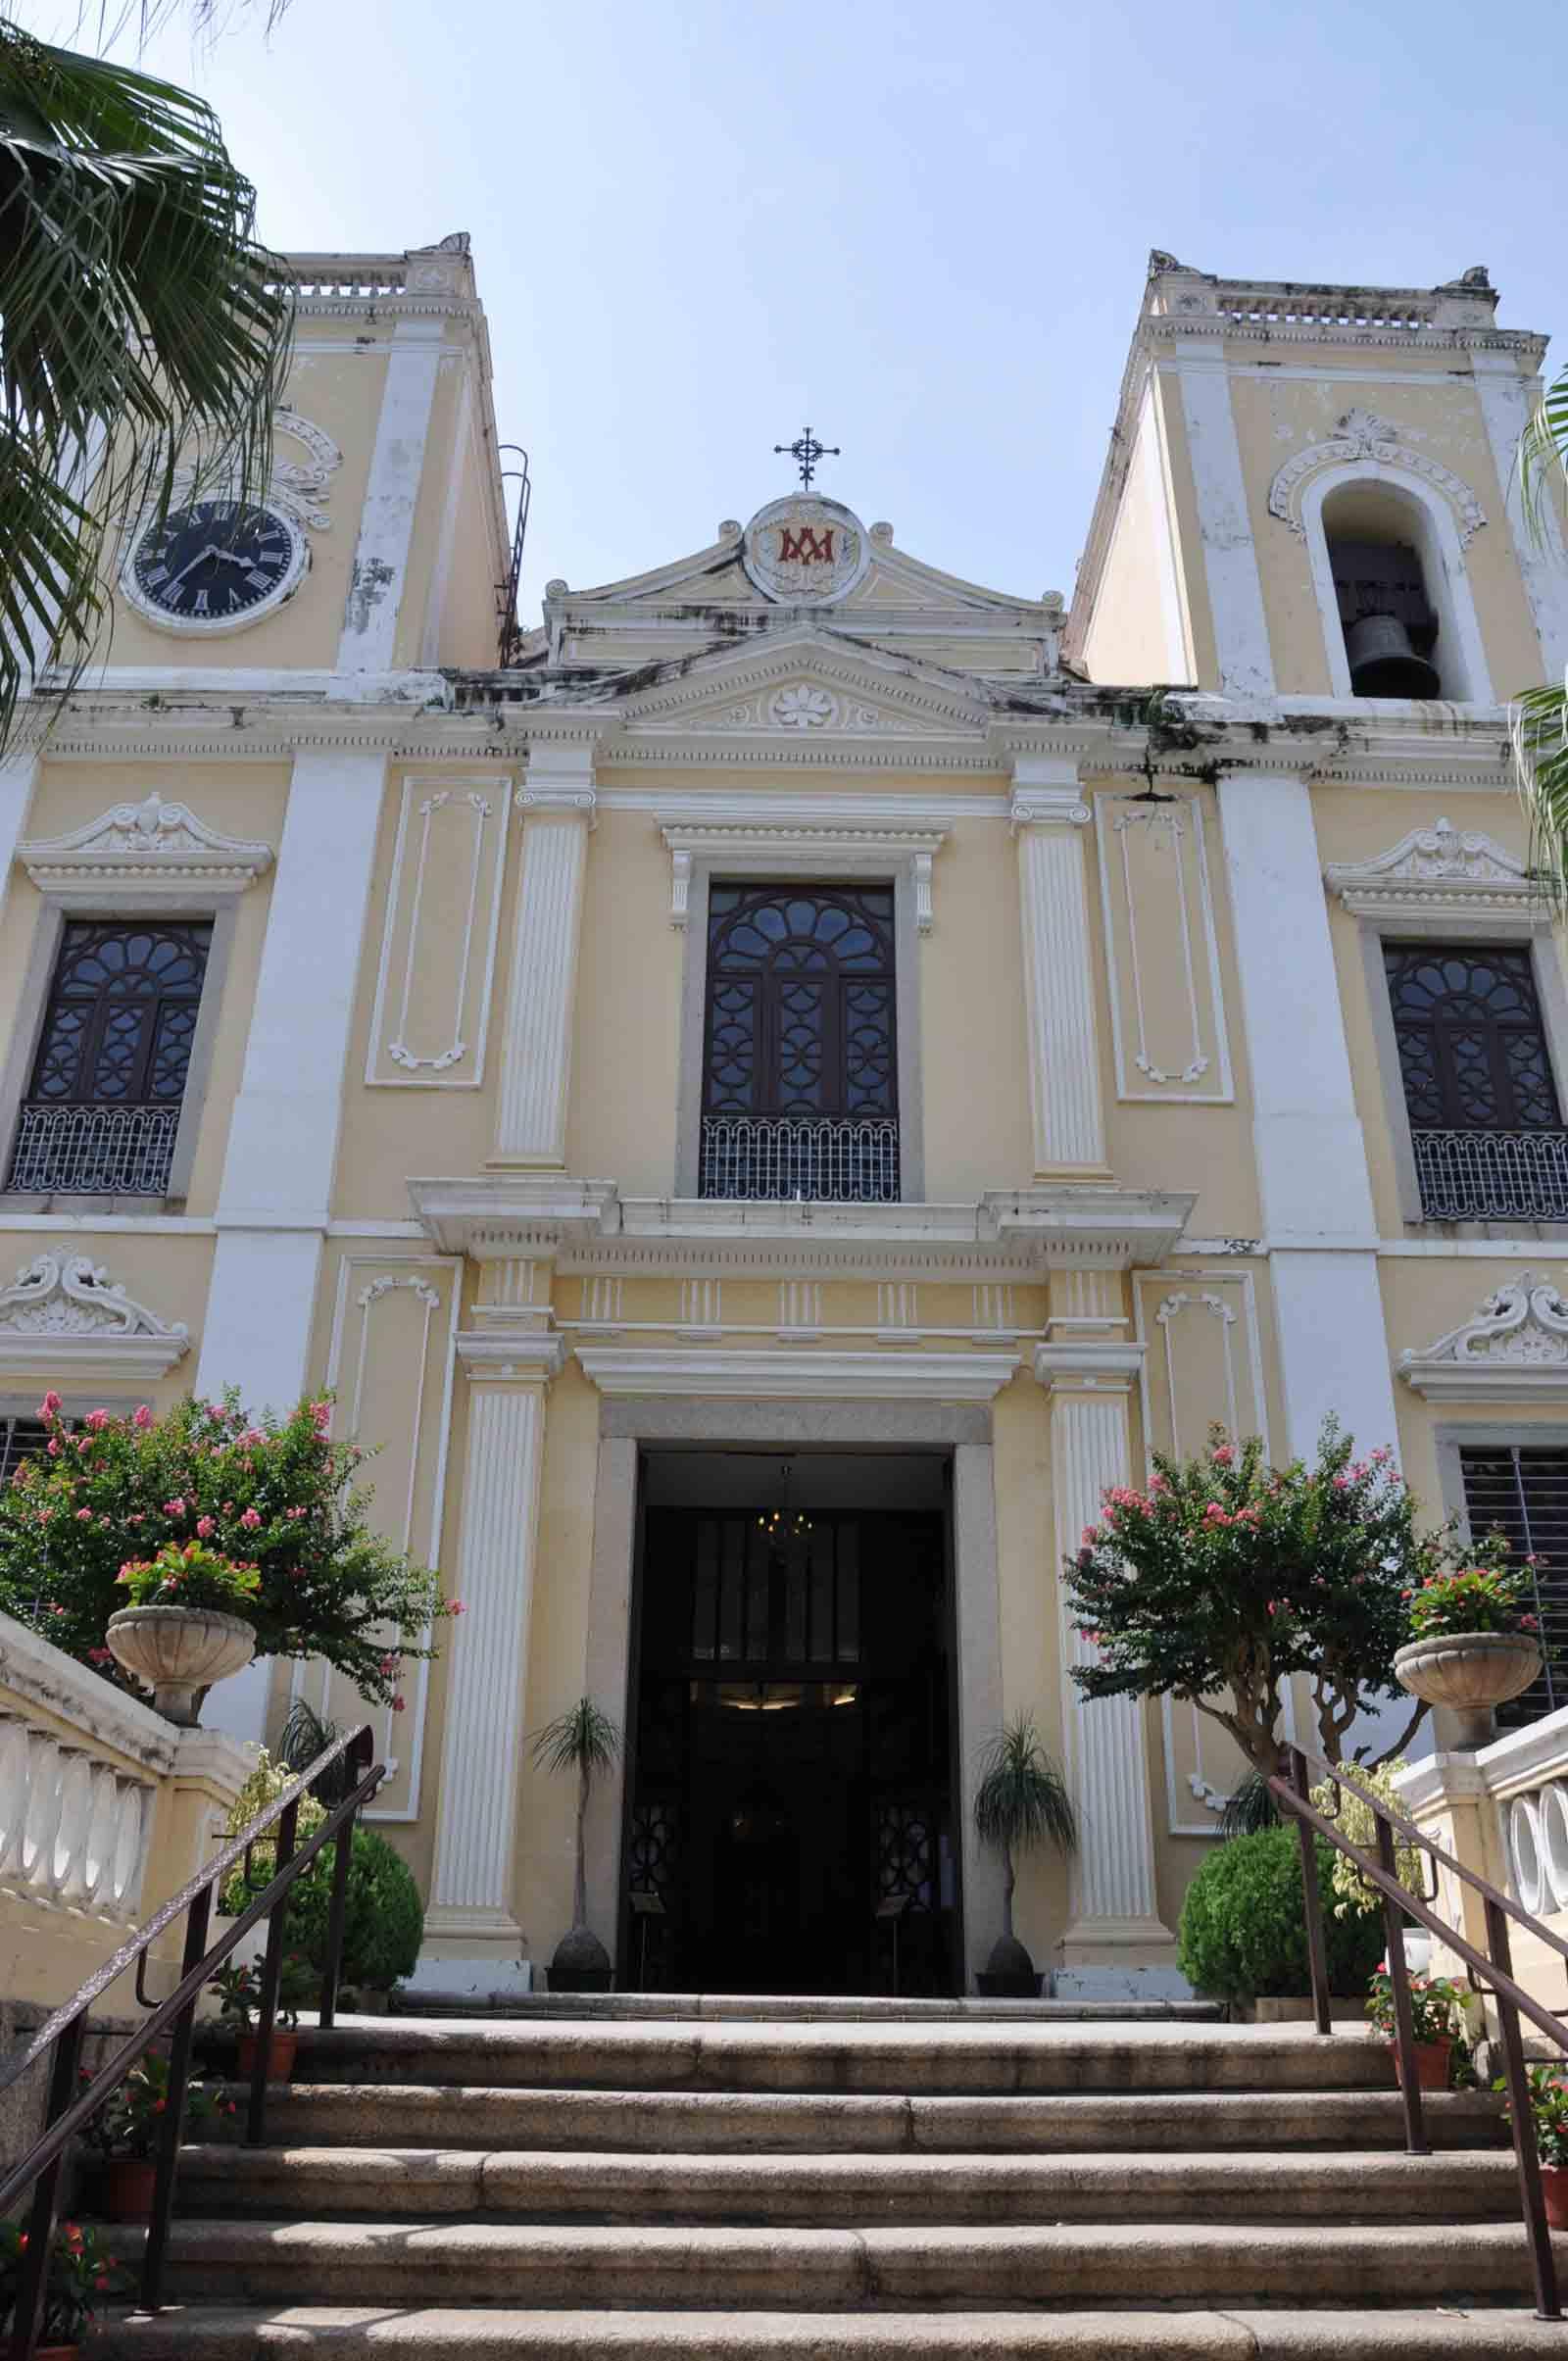 Macau world heritage site: St. Lawrence church